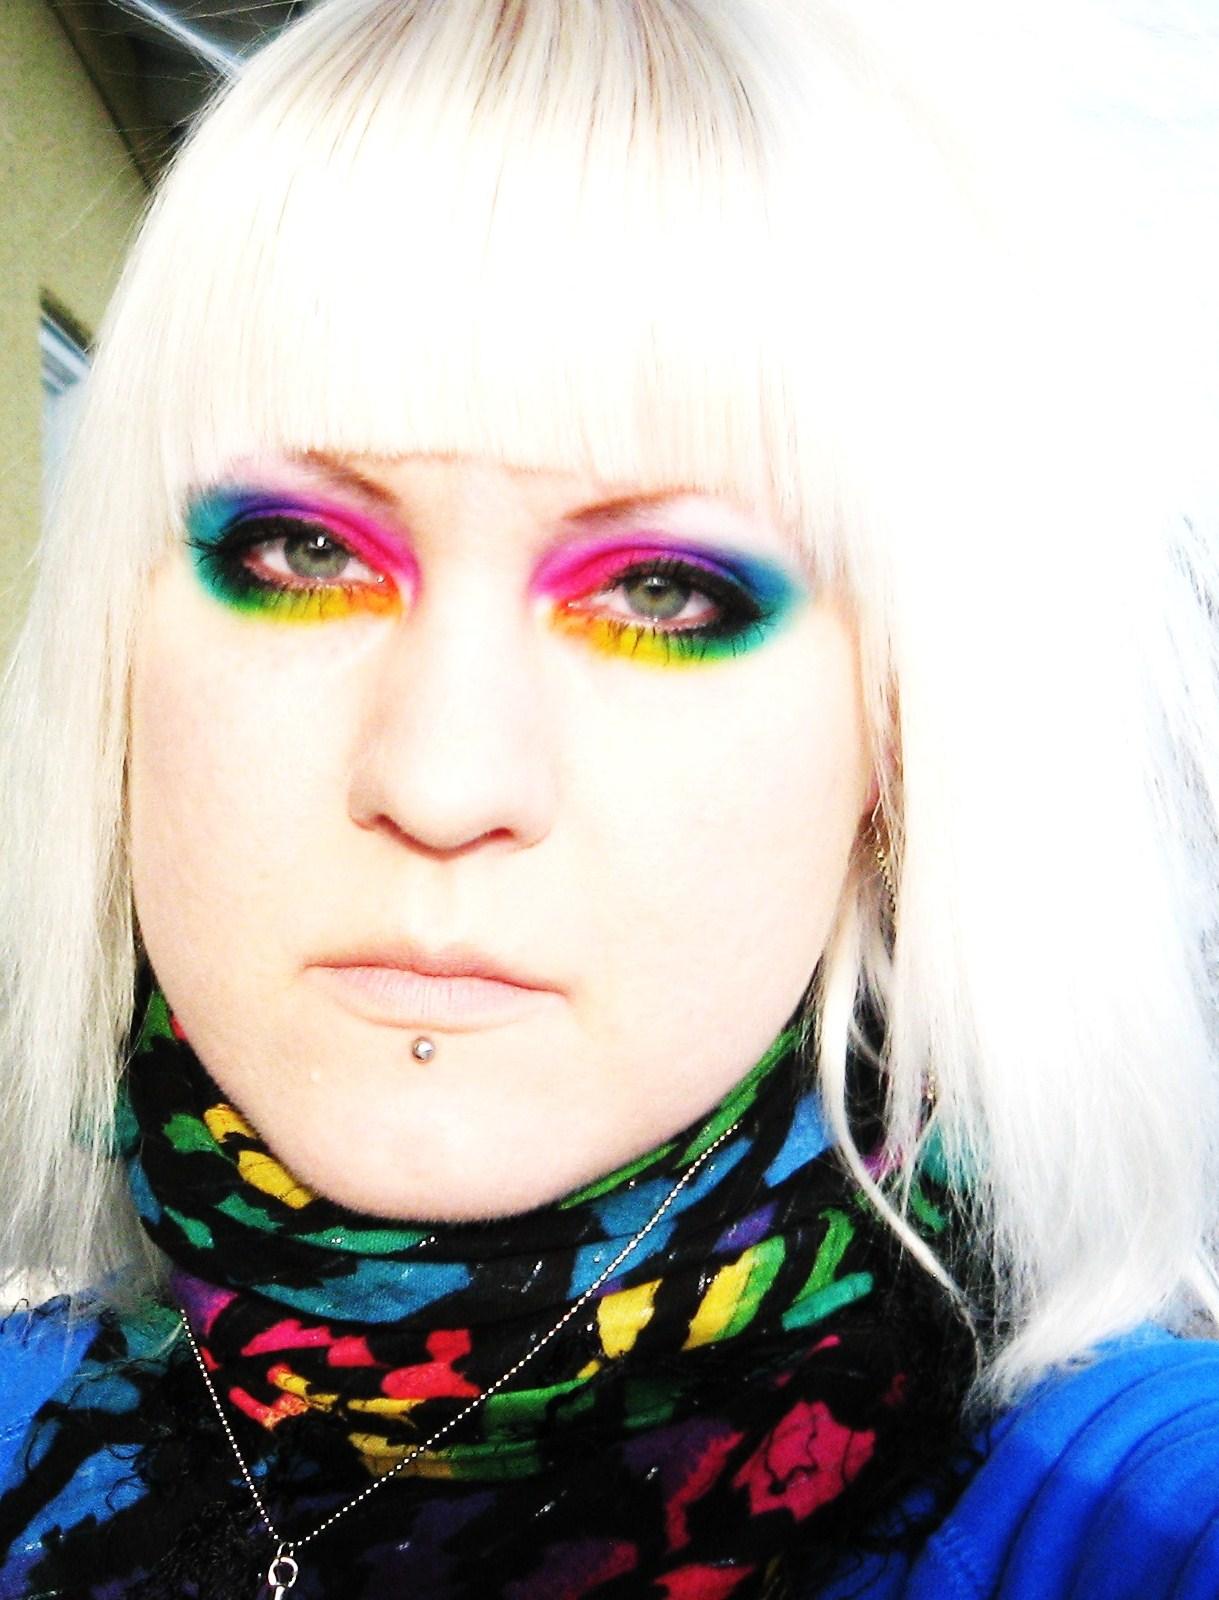 Emmas Make Up Make Up By Me On Me